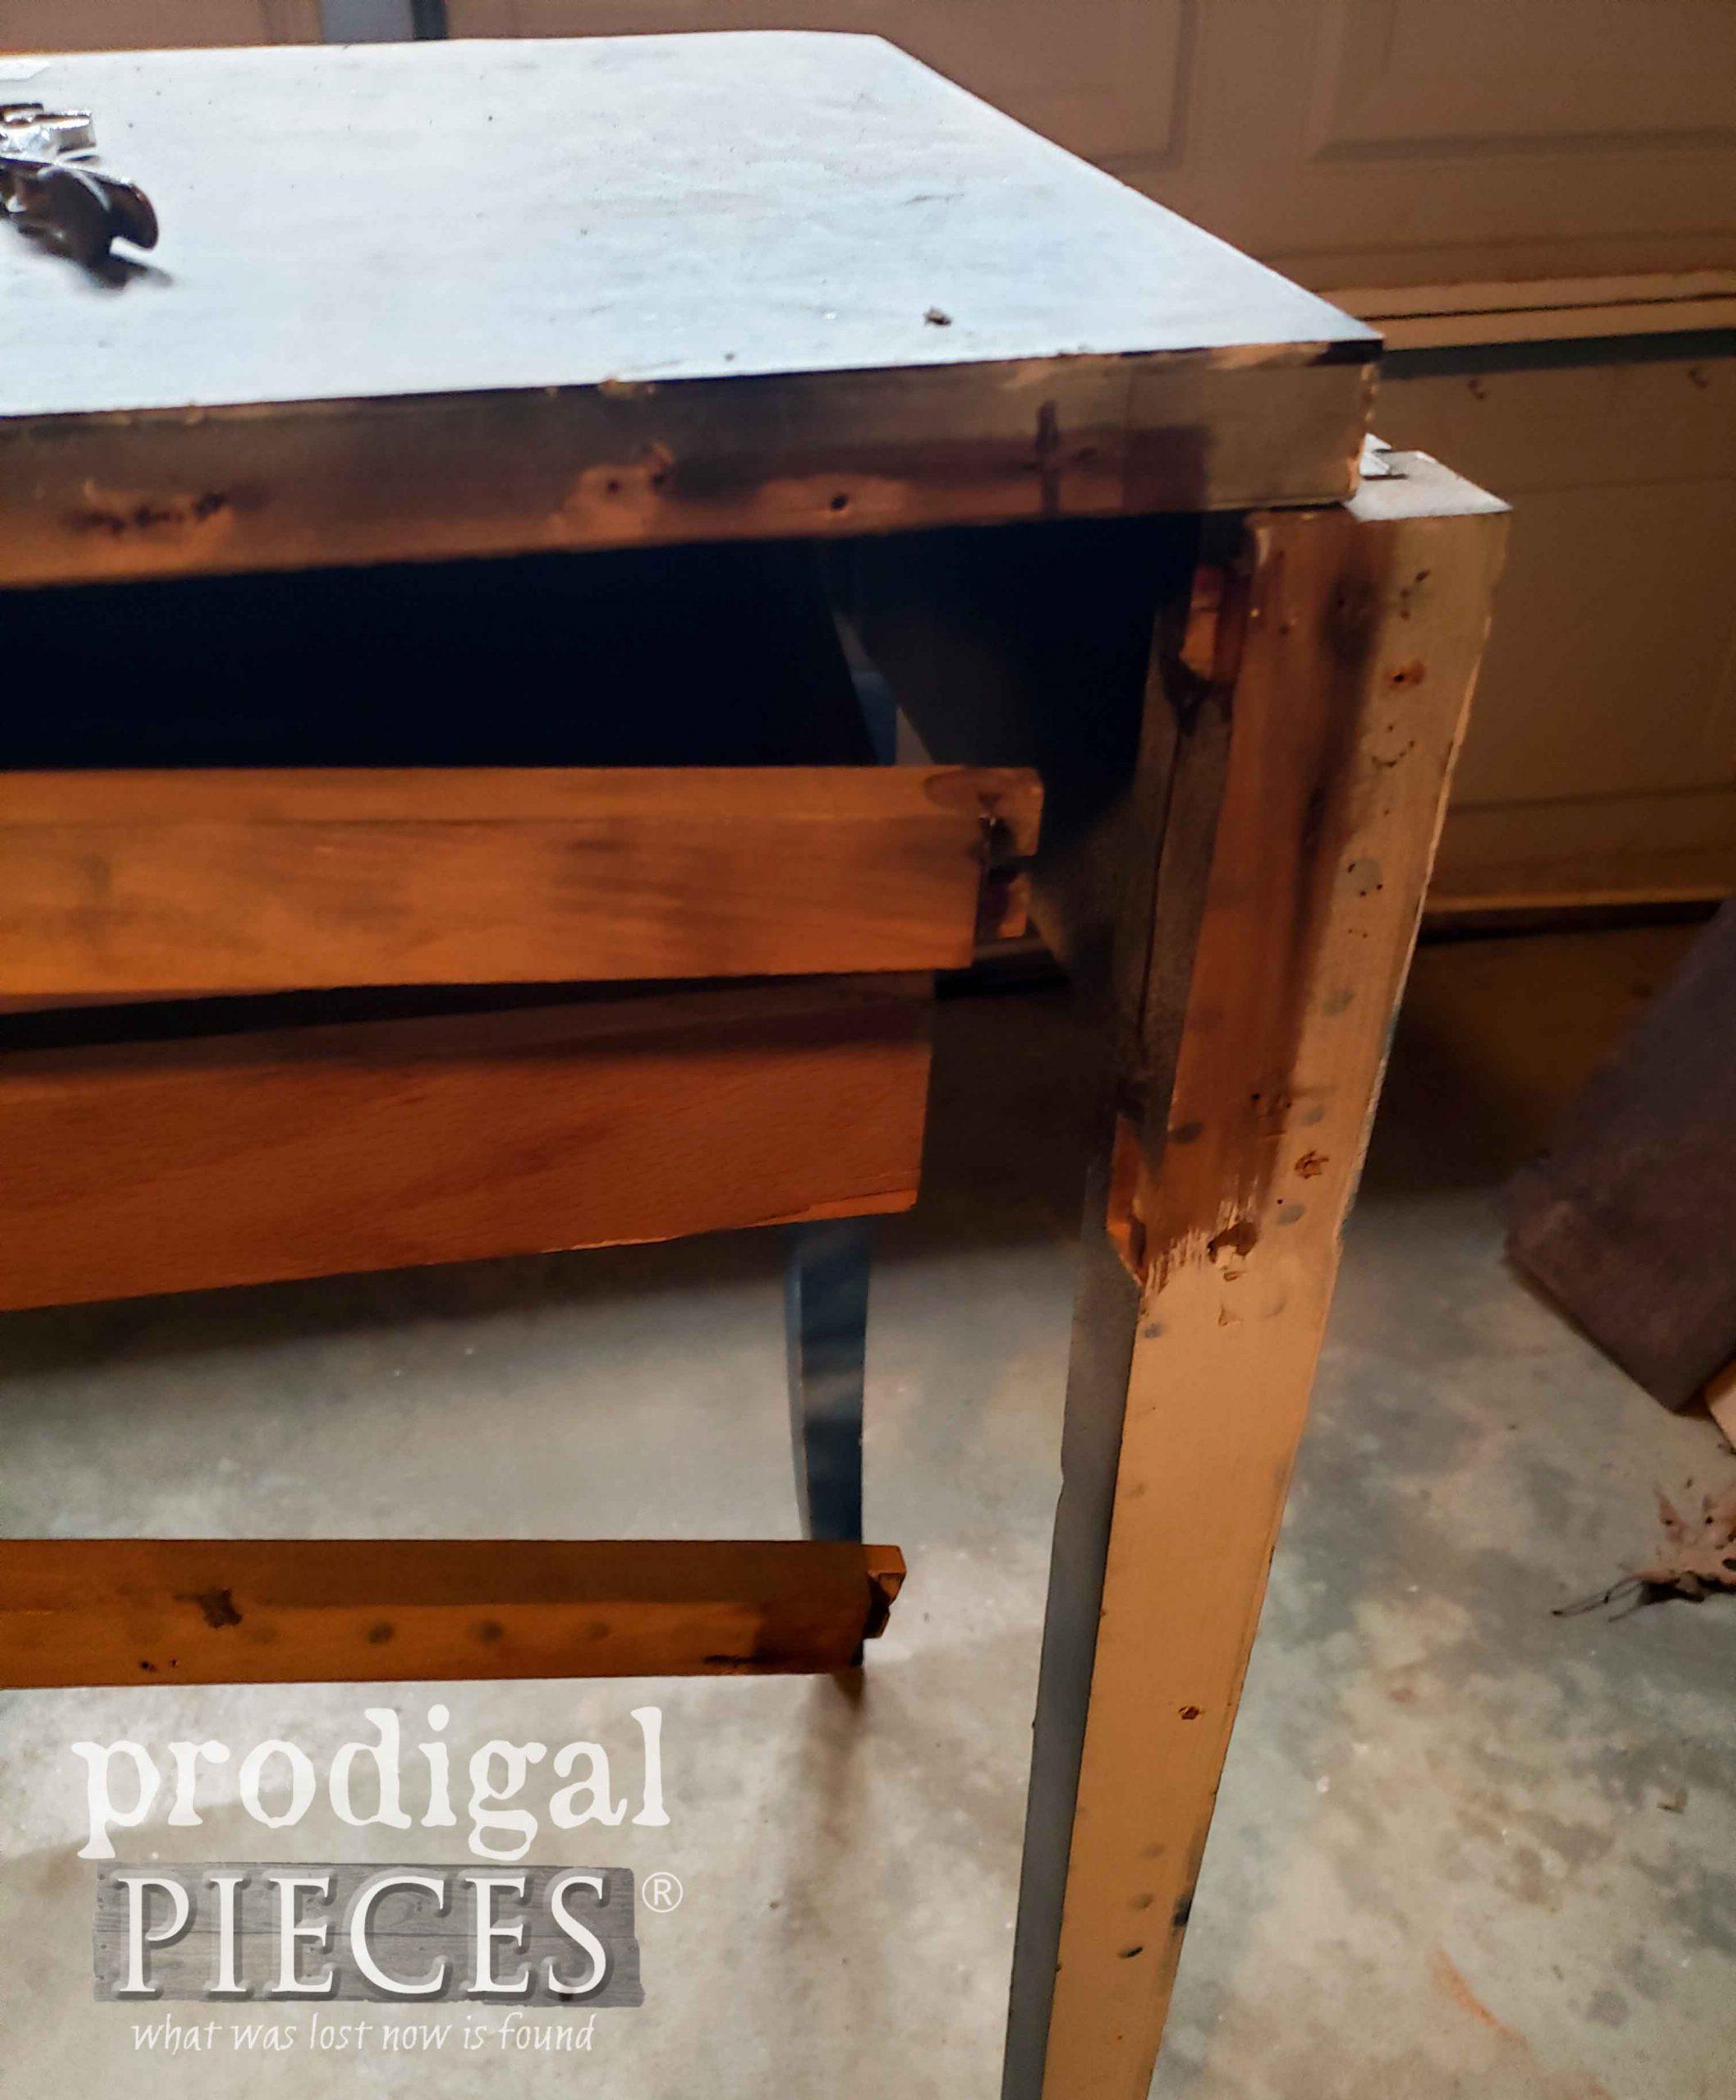 Broken Desk Needs Repair | prodigalpieces.com